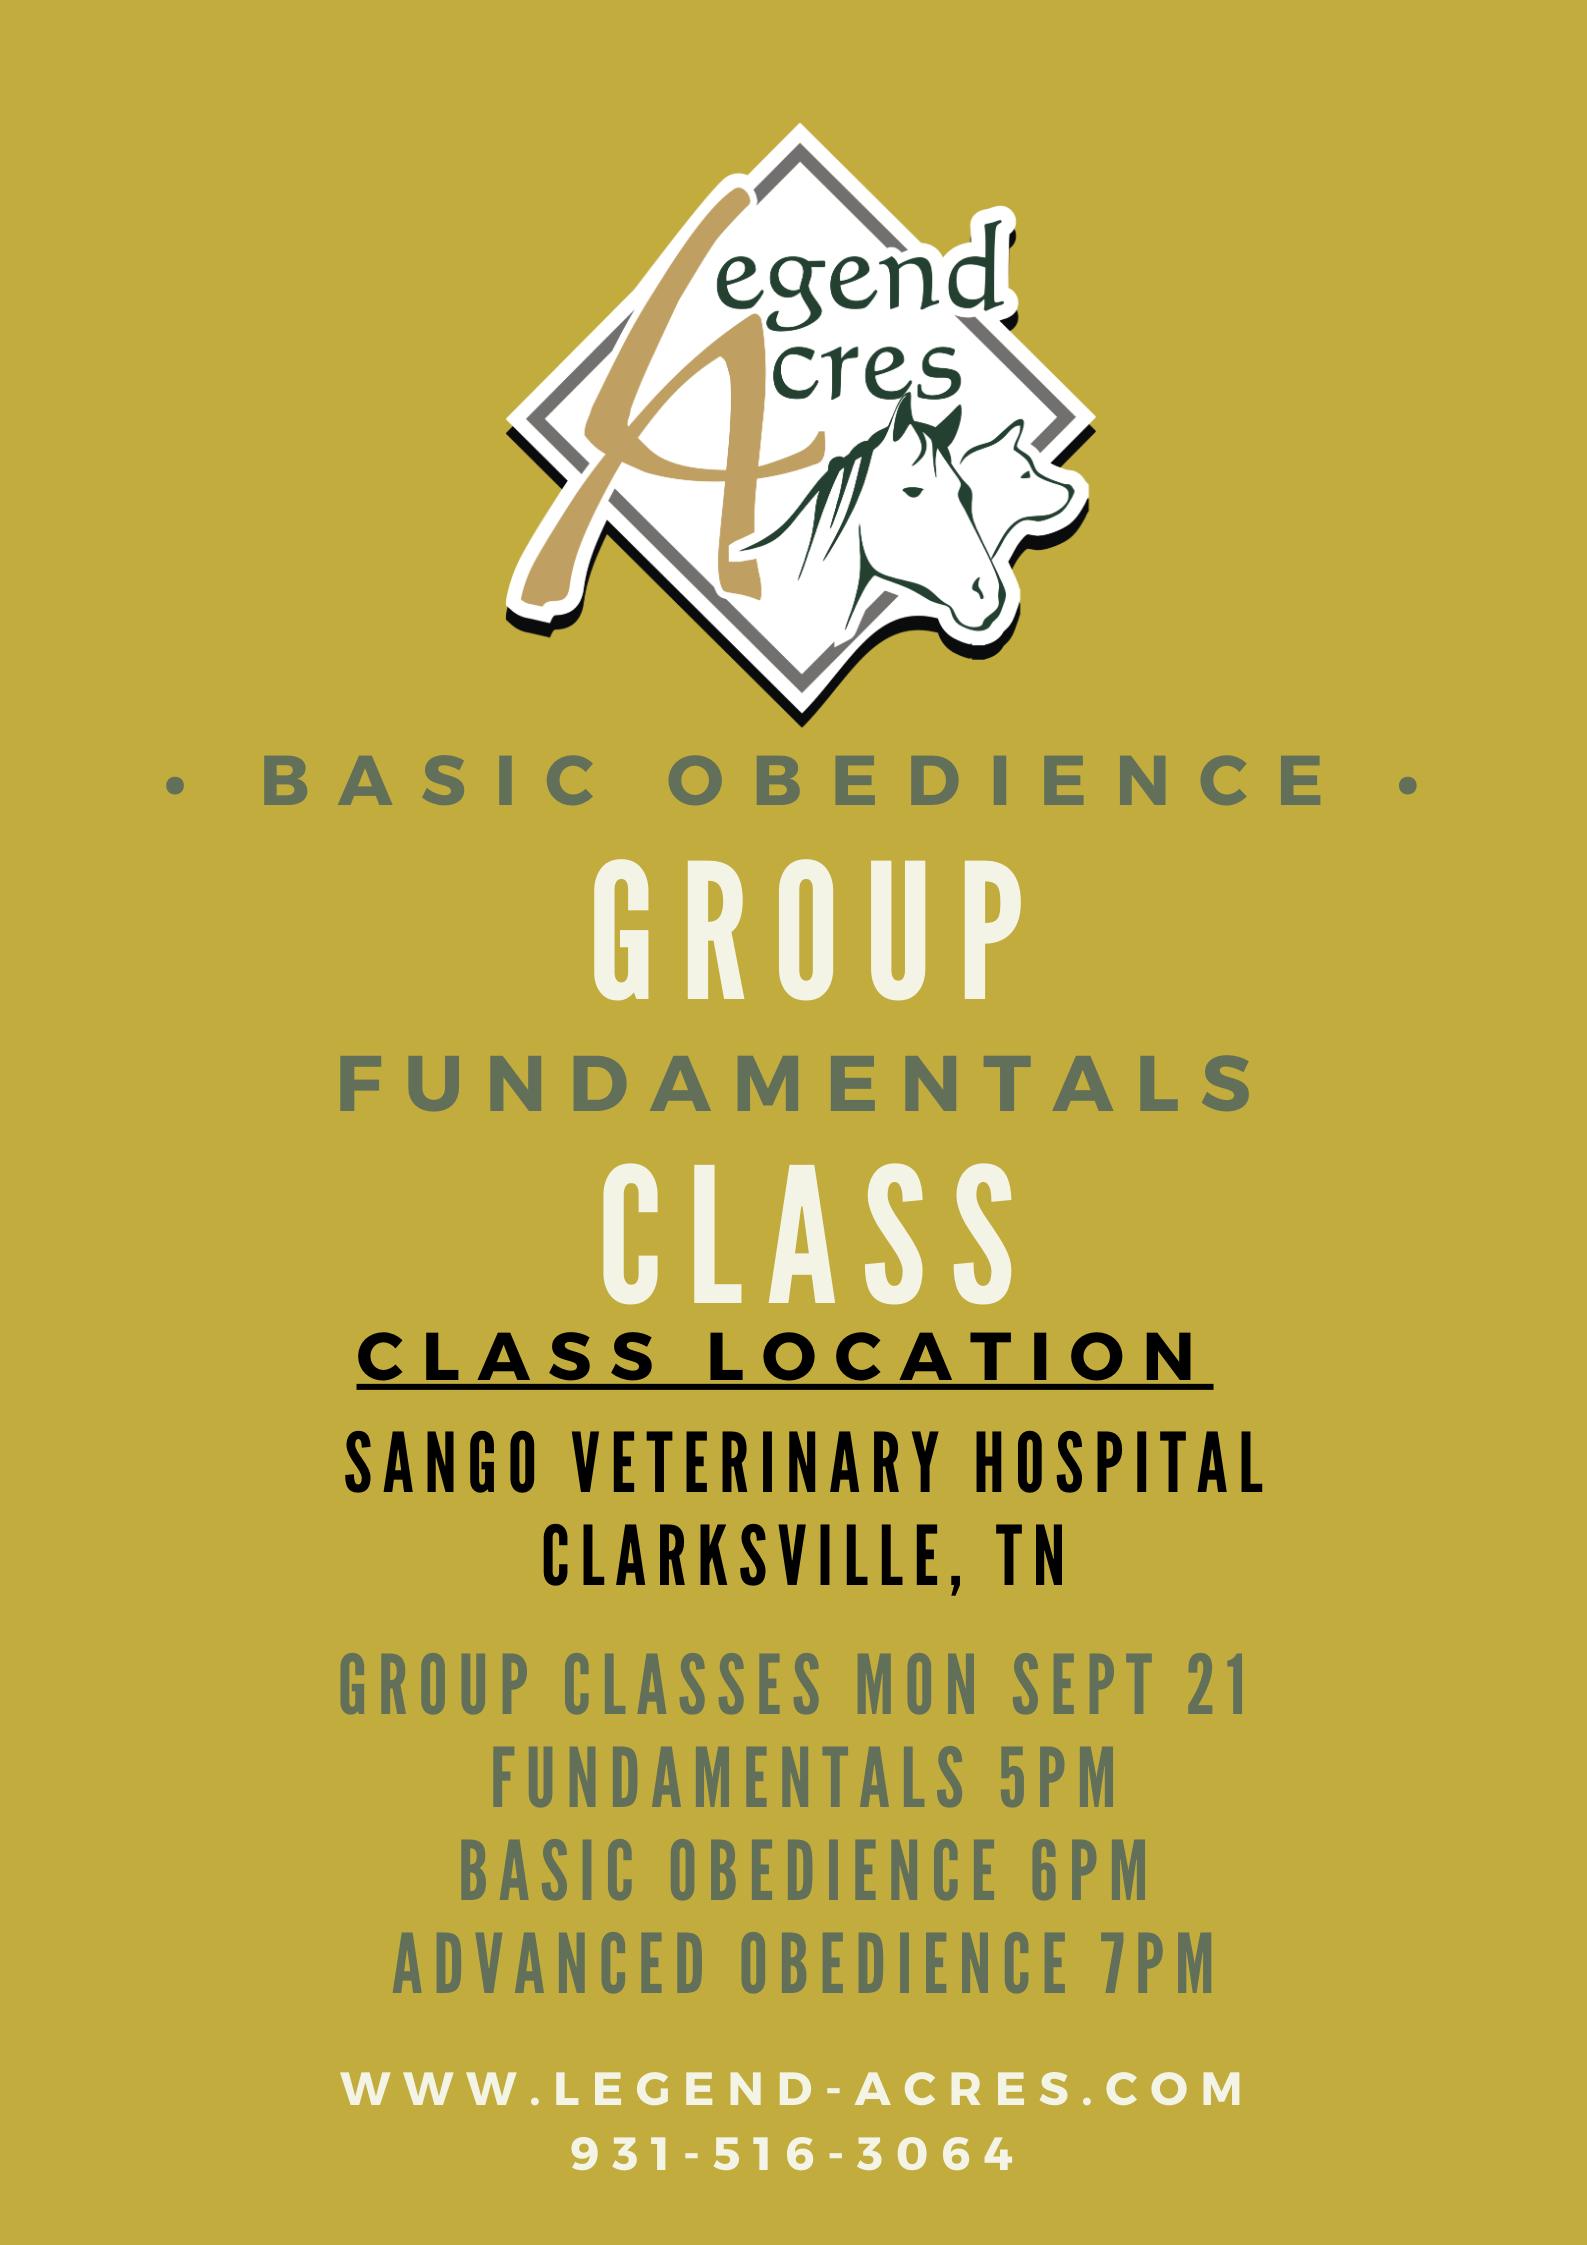 Group Classes Sango Vet Clarksville, TN